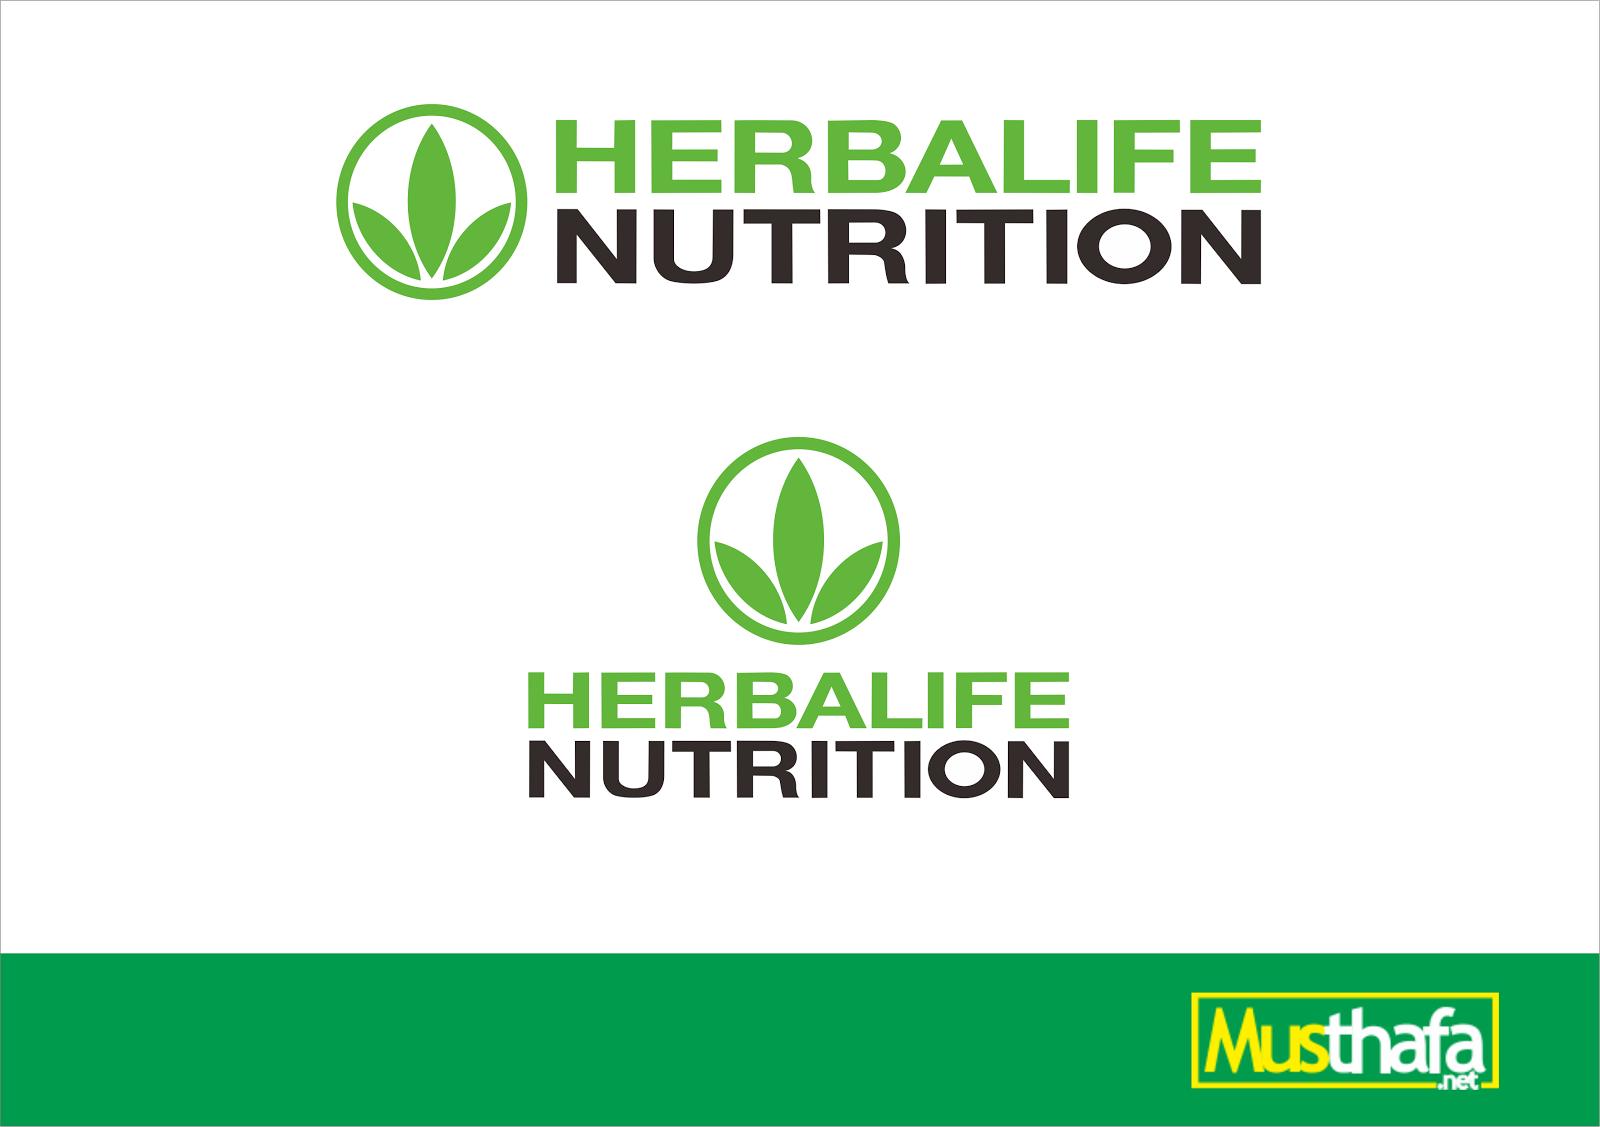 New Logo Herbalife CRD Vector Herbalife Nutrition - Stok Logo